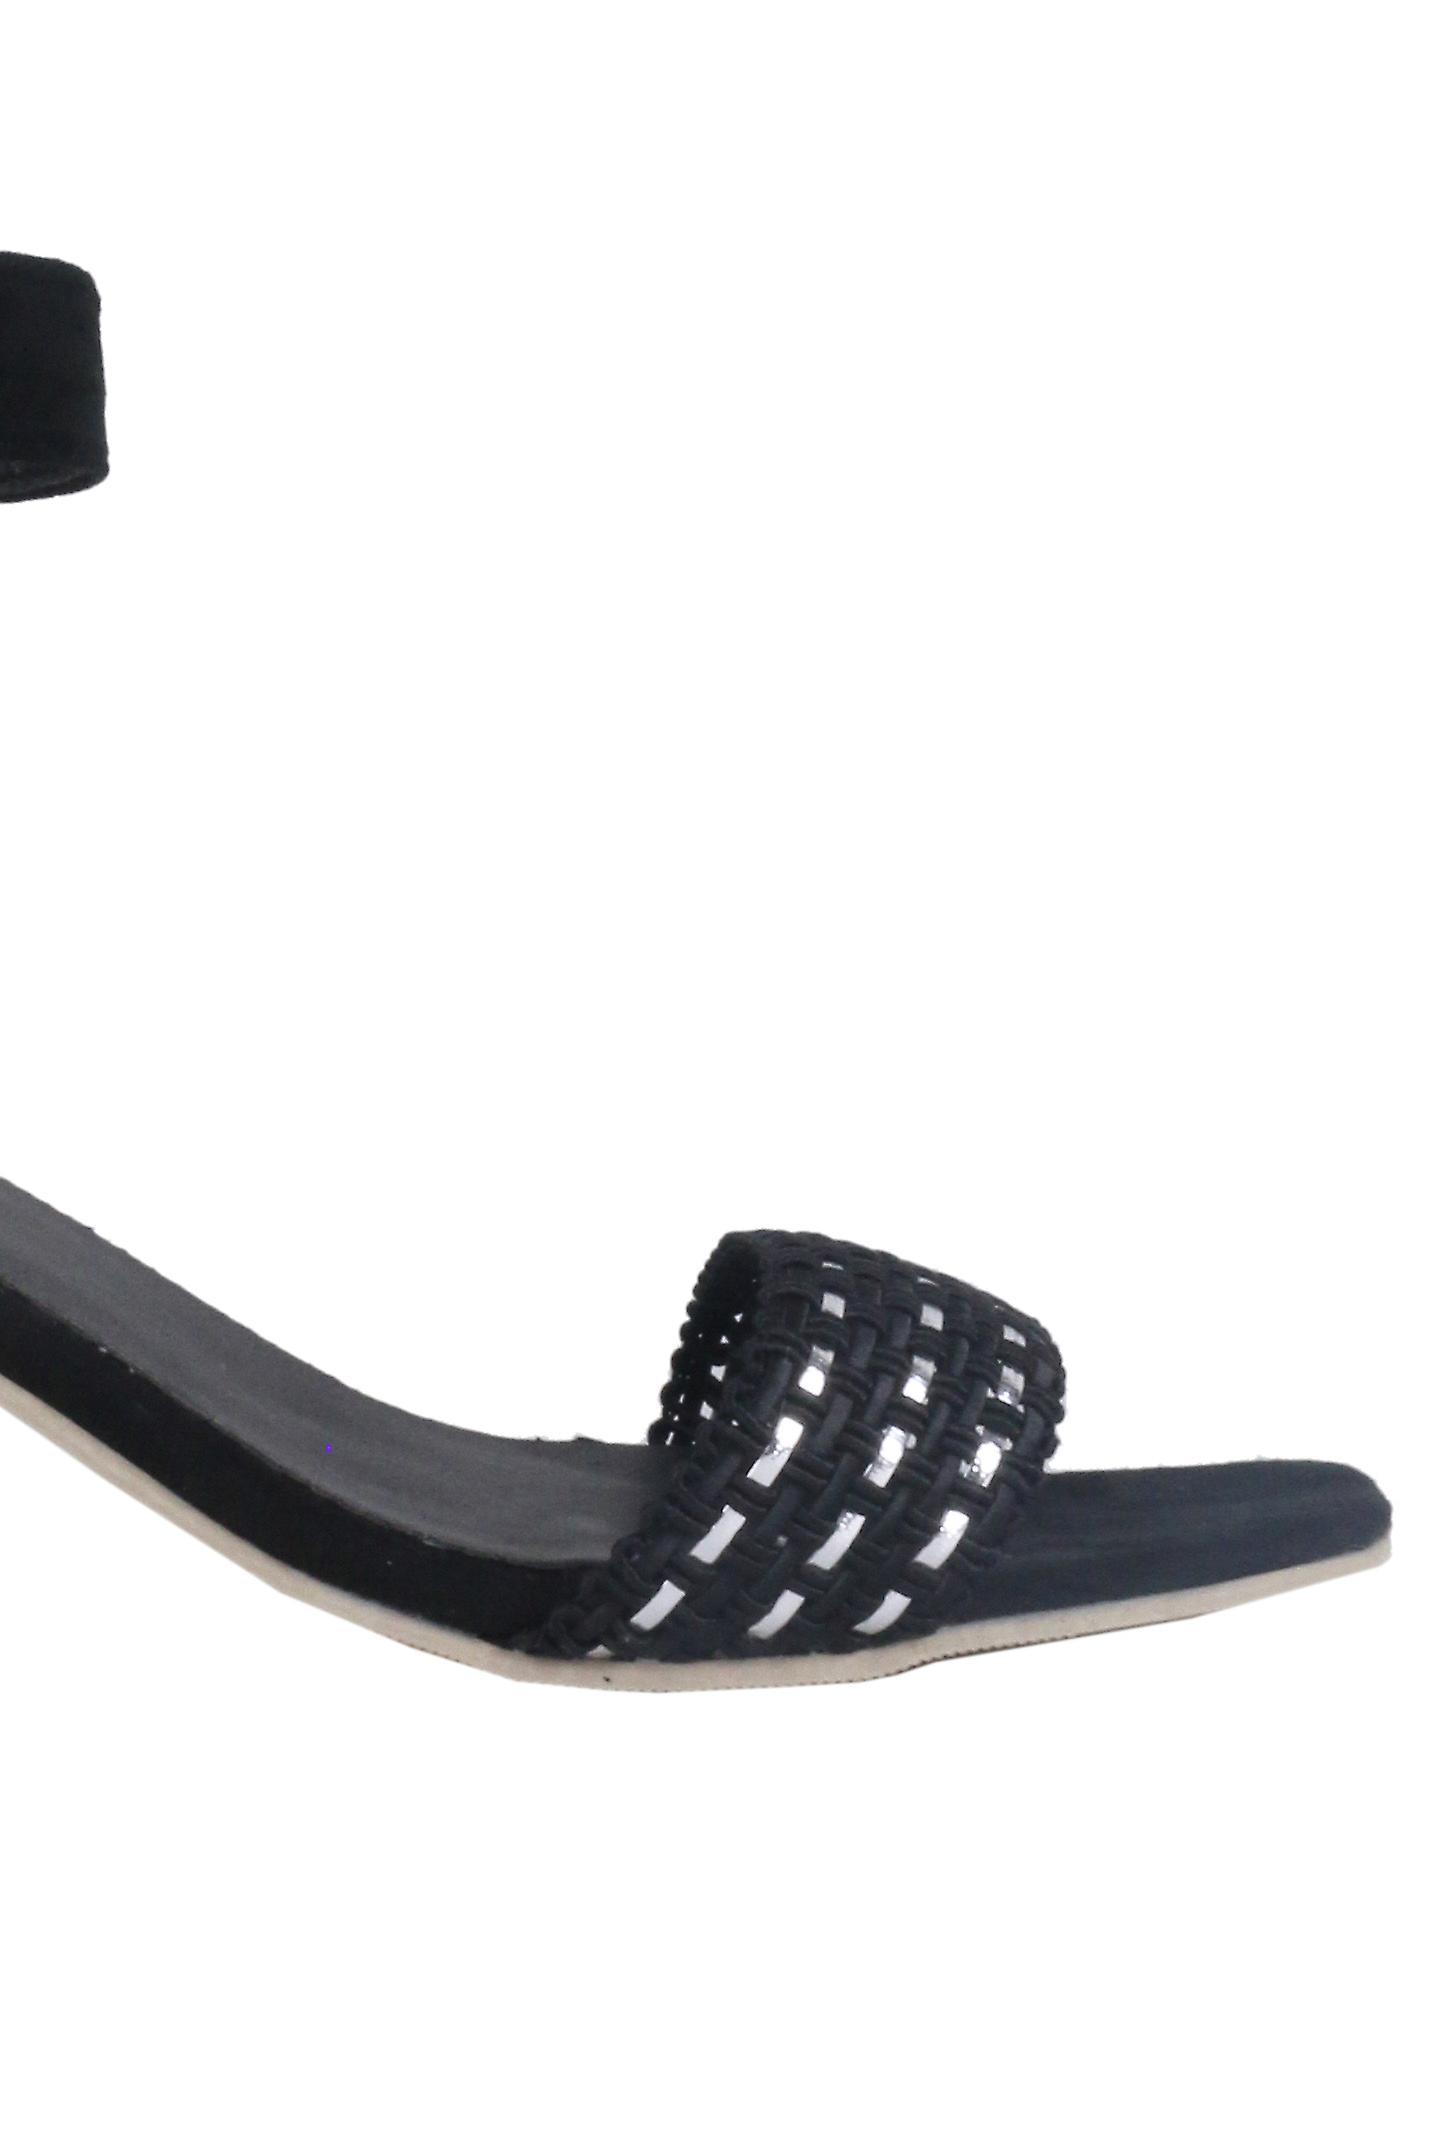 Lovemystyle Black Block Heel Sandal With Silver Weave Design